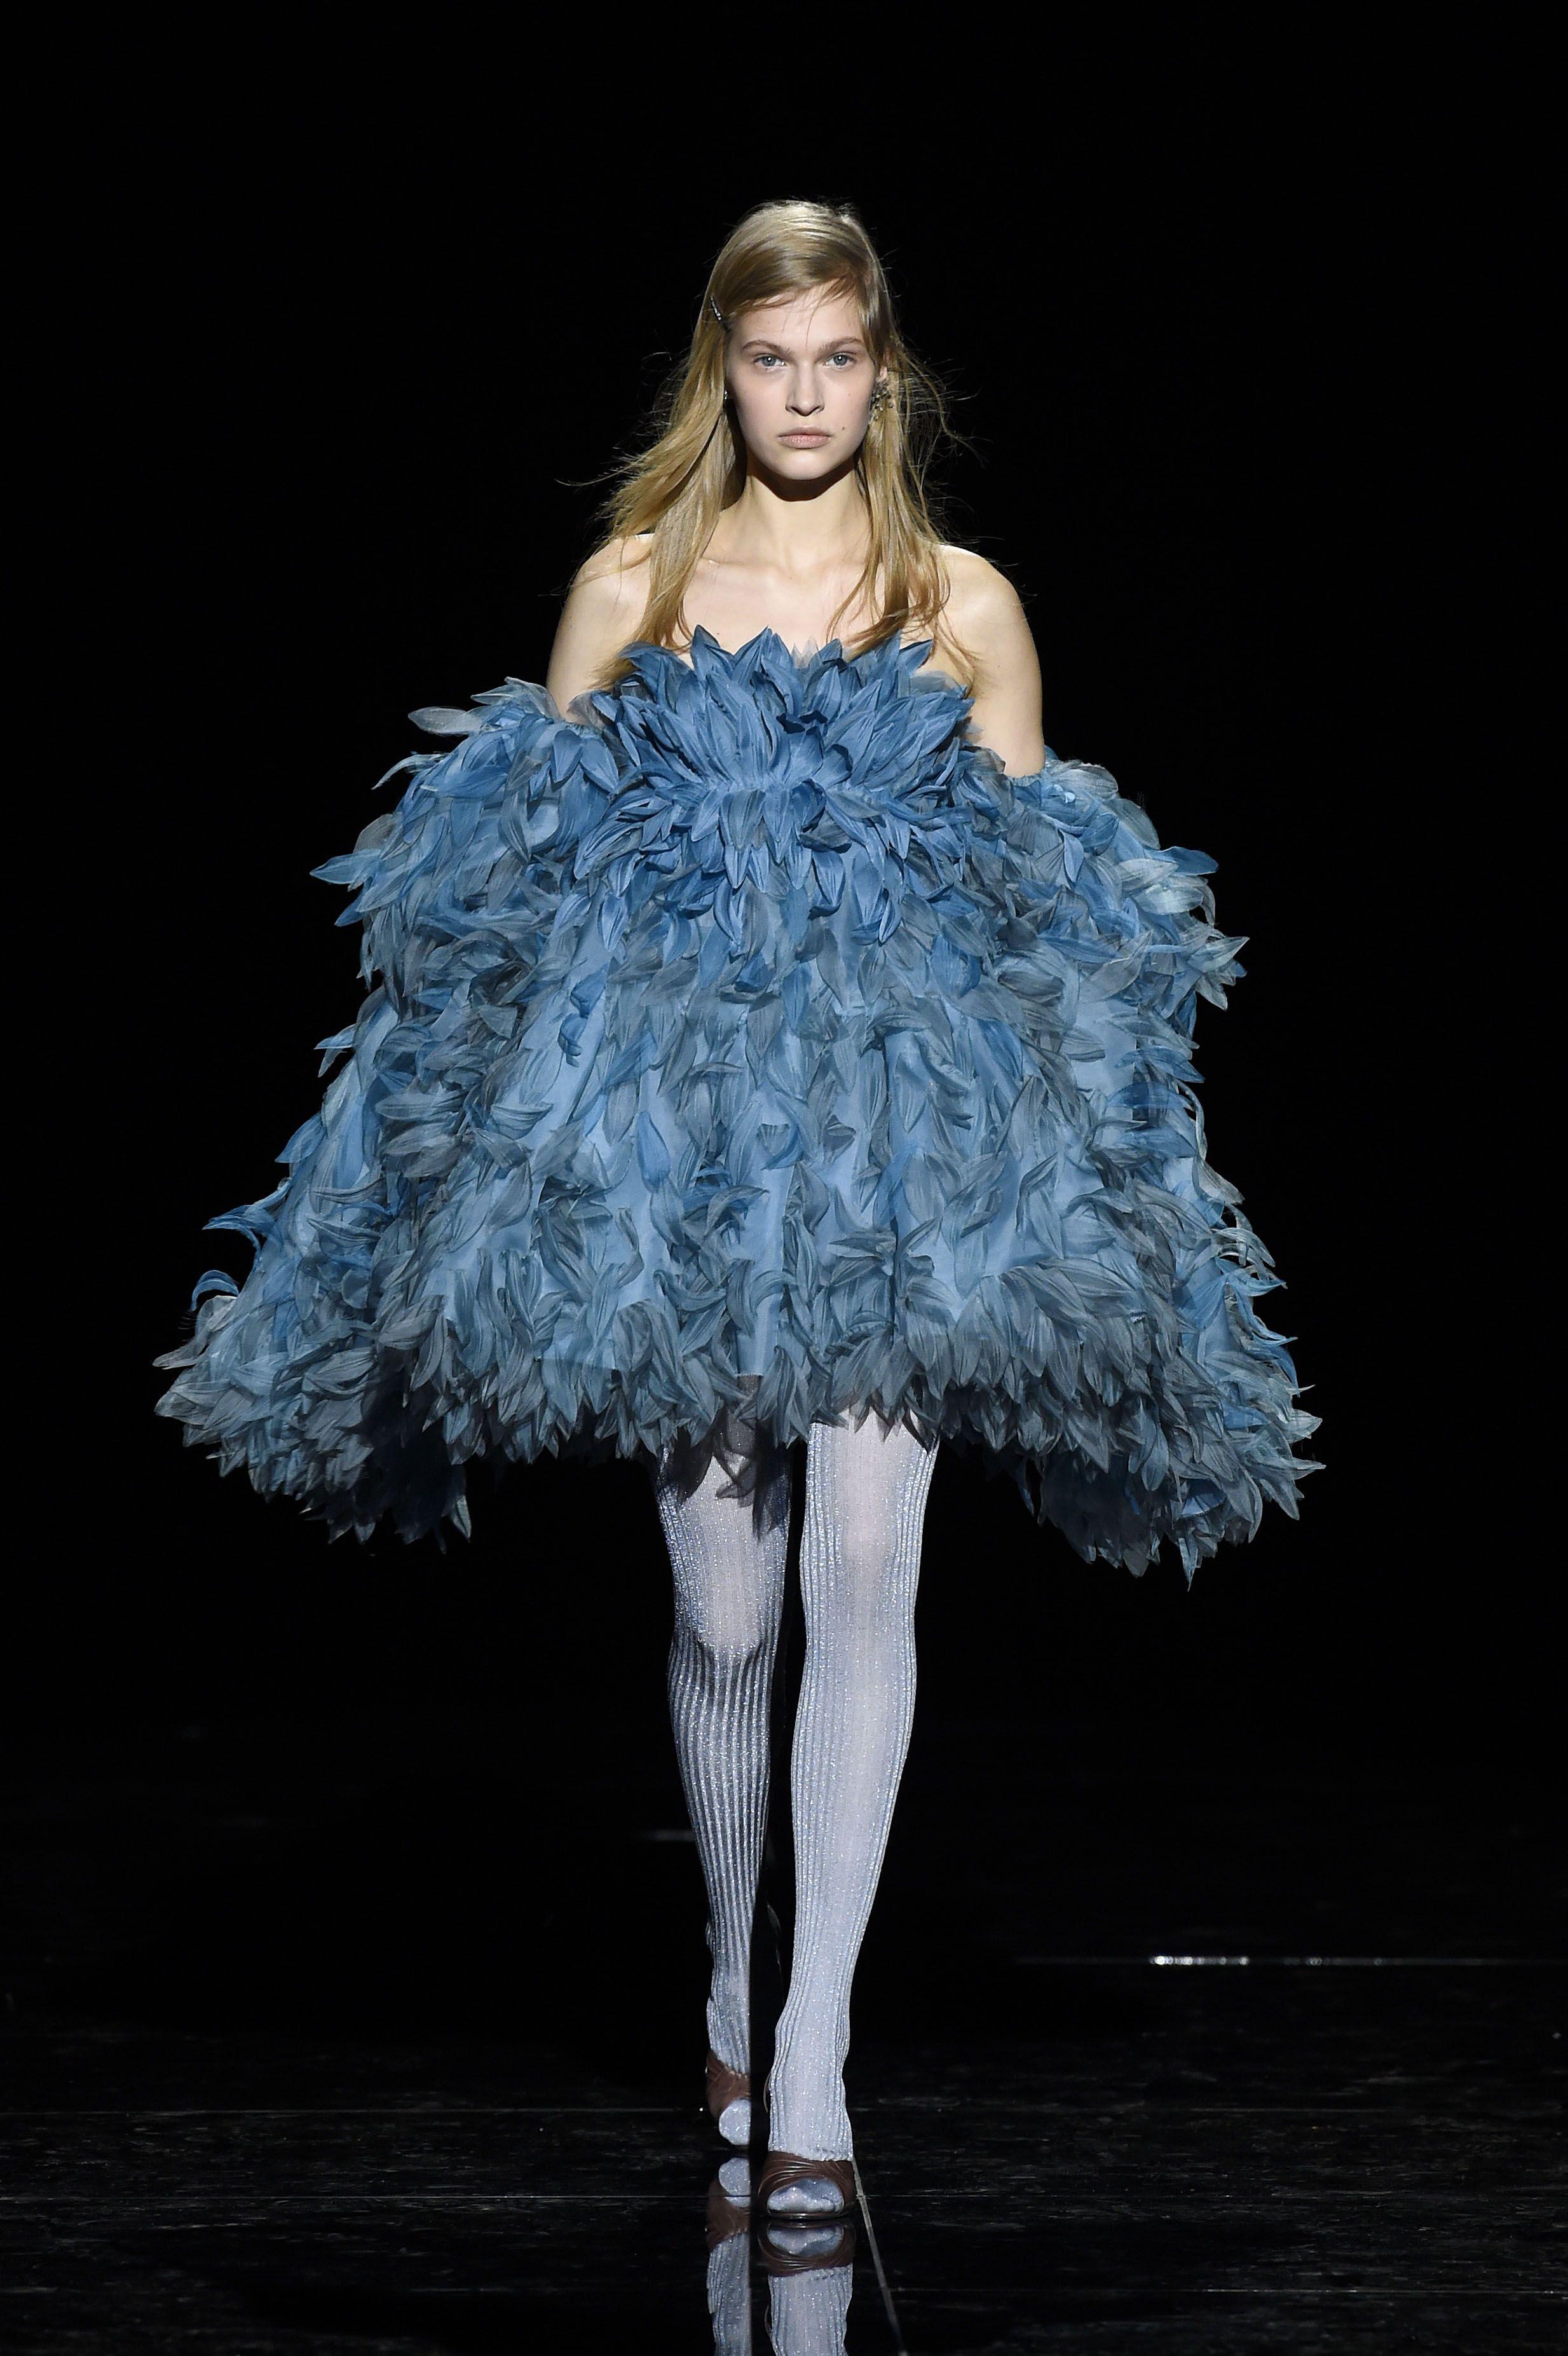 11010ded1ccf Best Looks New York Fashion Week Fall Winter 2019 - The Best Looks from New  York Fashion Week Fall Winter 2019